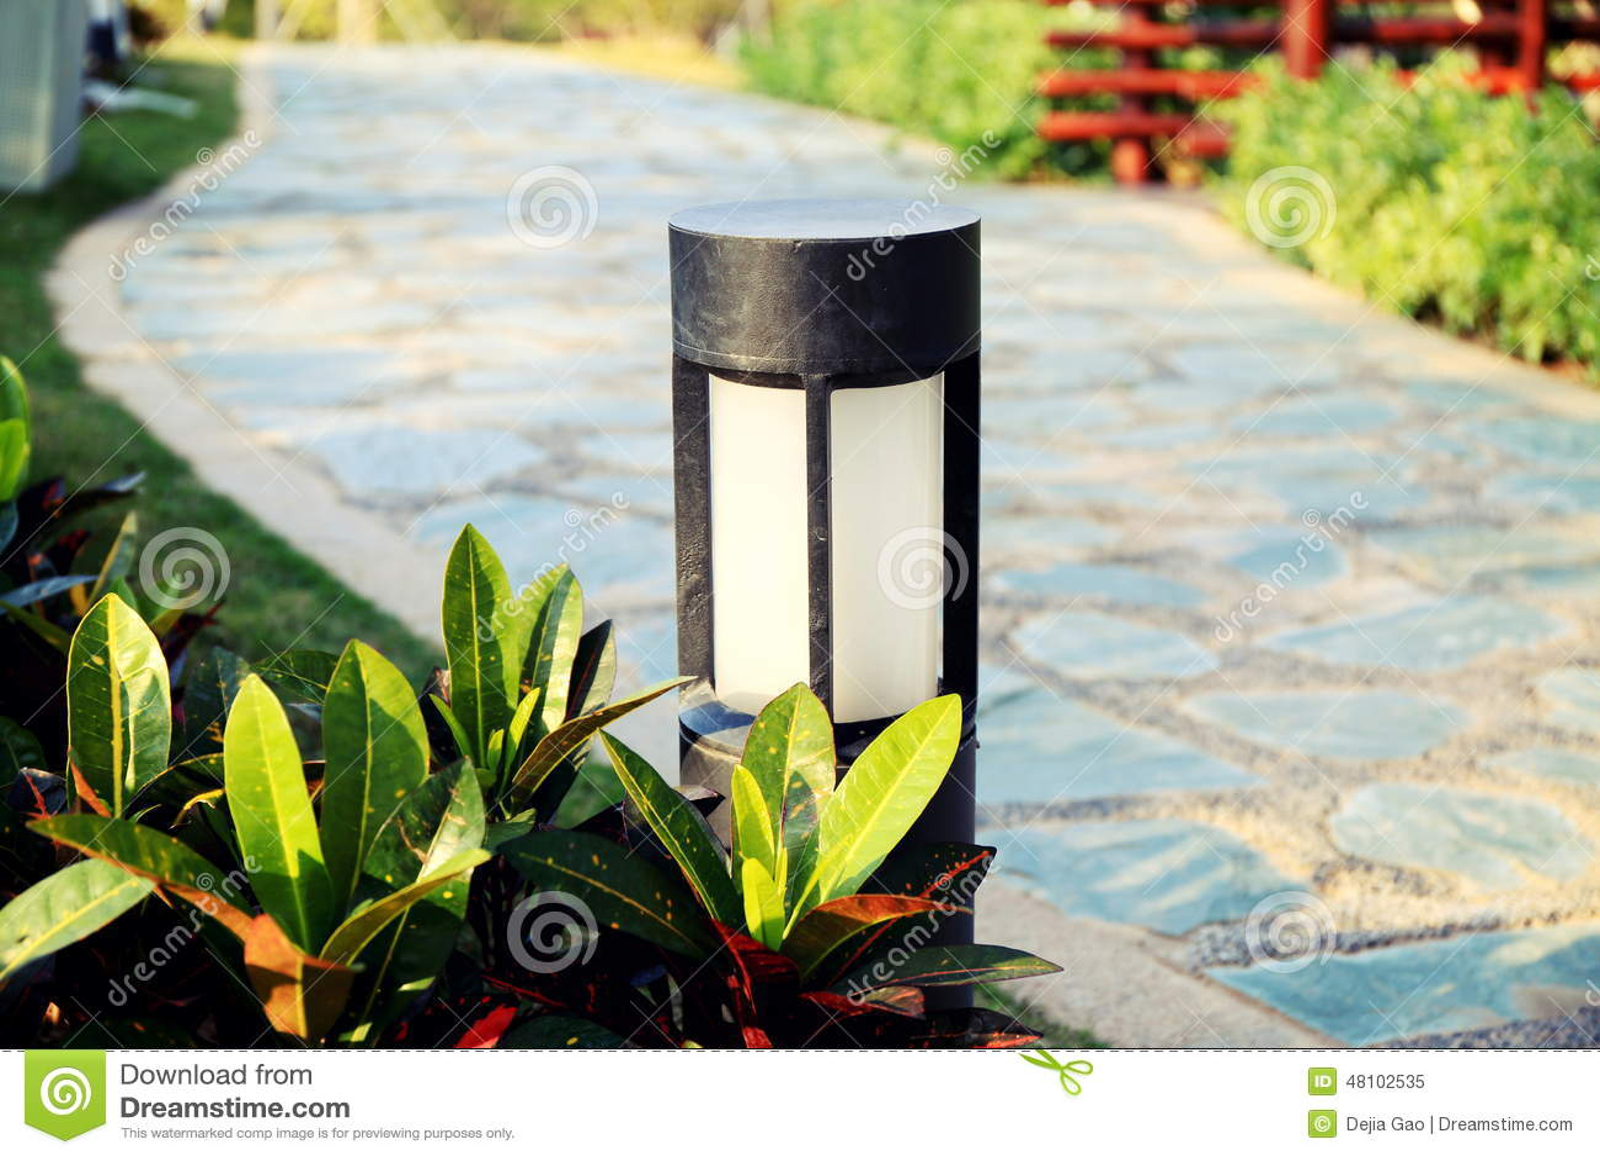 55 283 Landscape Lighting Photos Free Amp Royalty Free